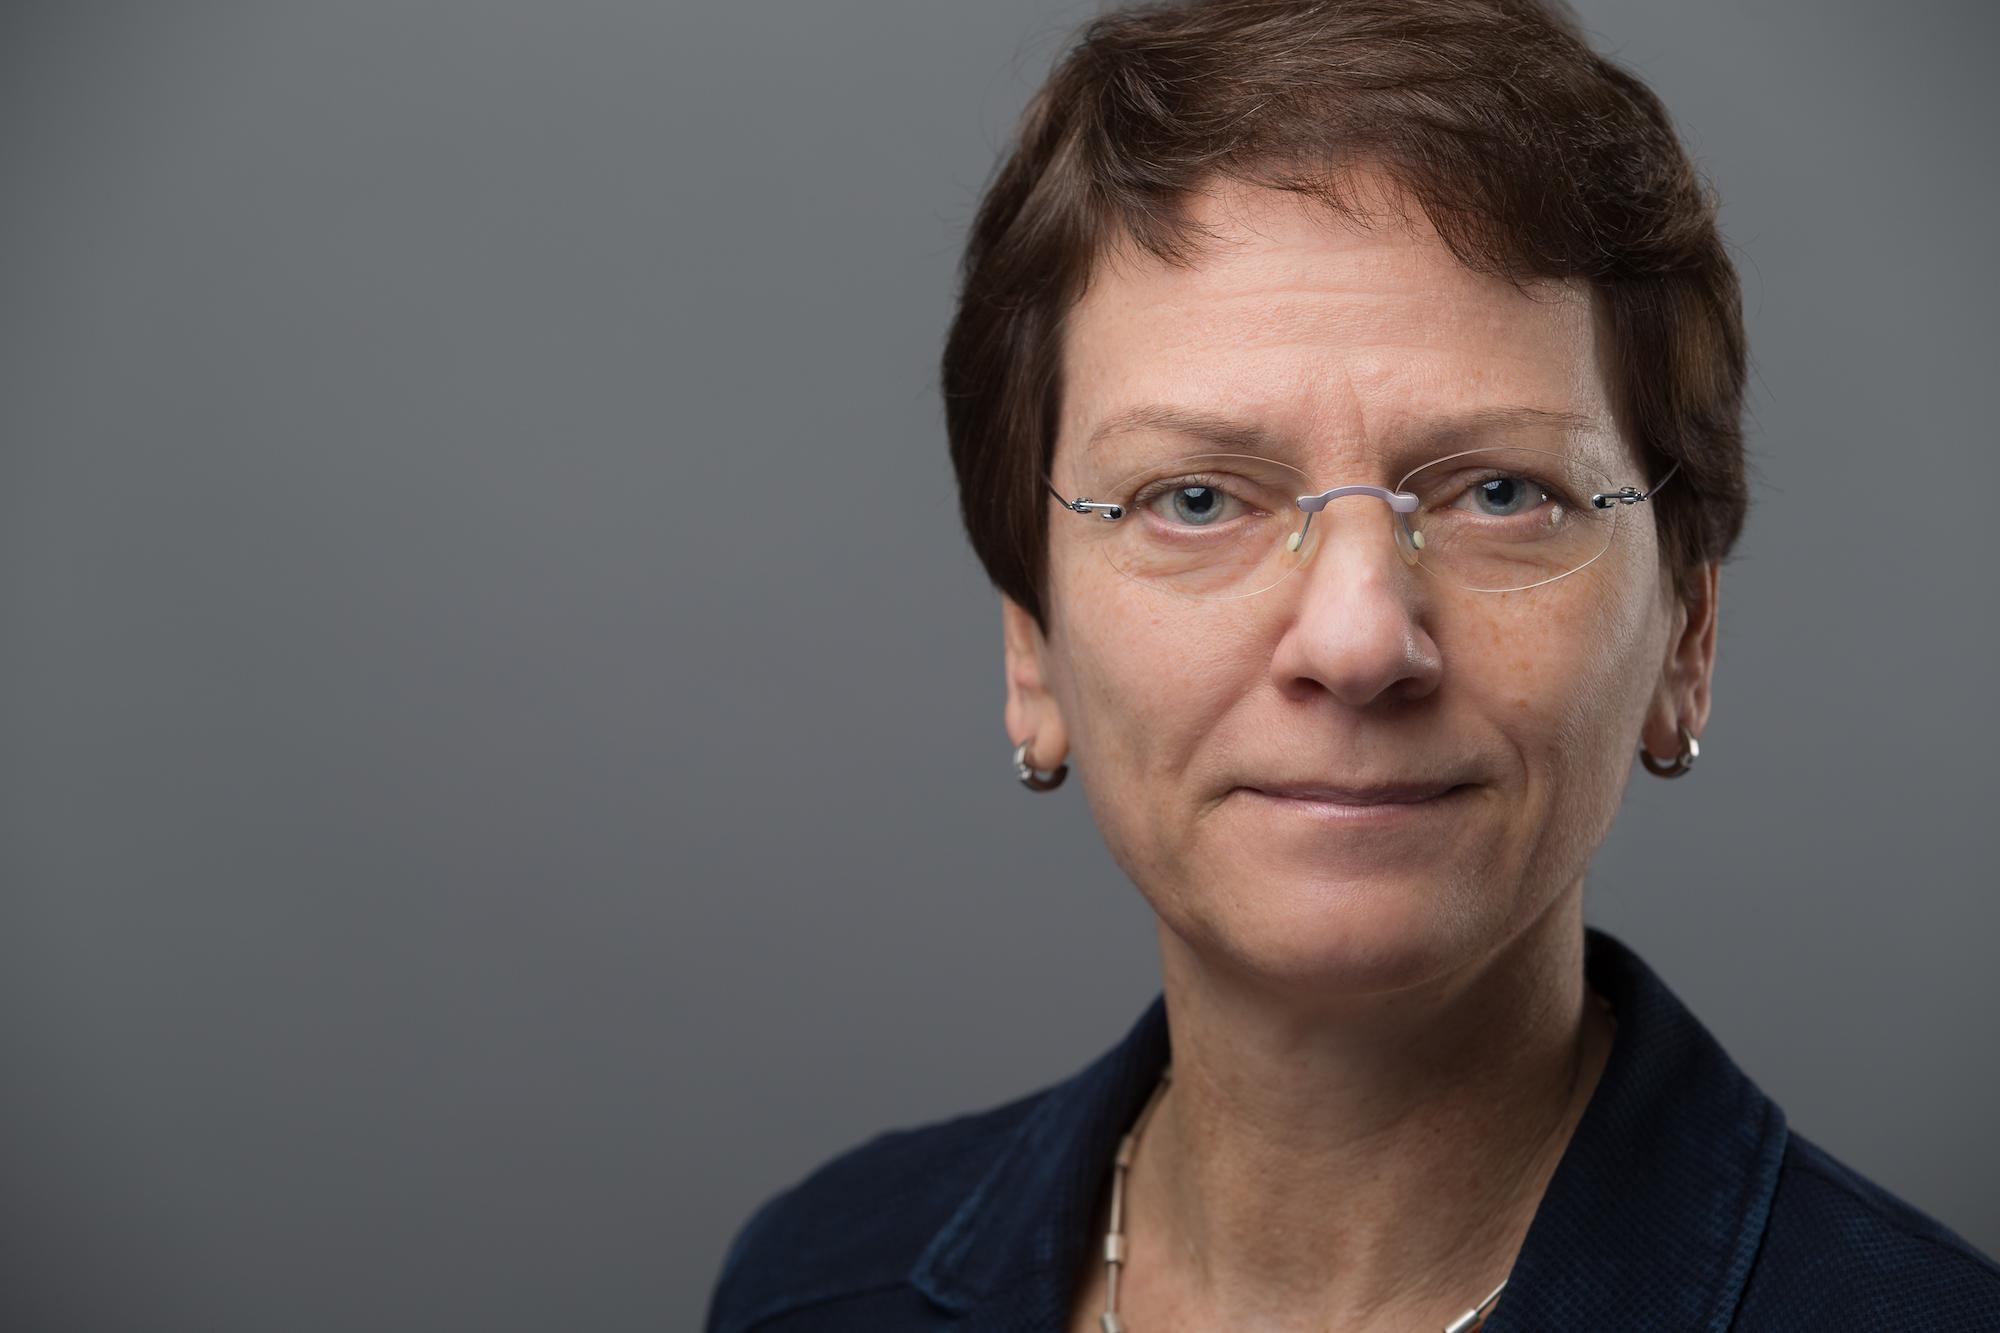 Rechtspsychologie Sekretariat Carolin Nettemann